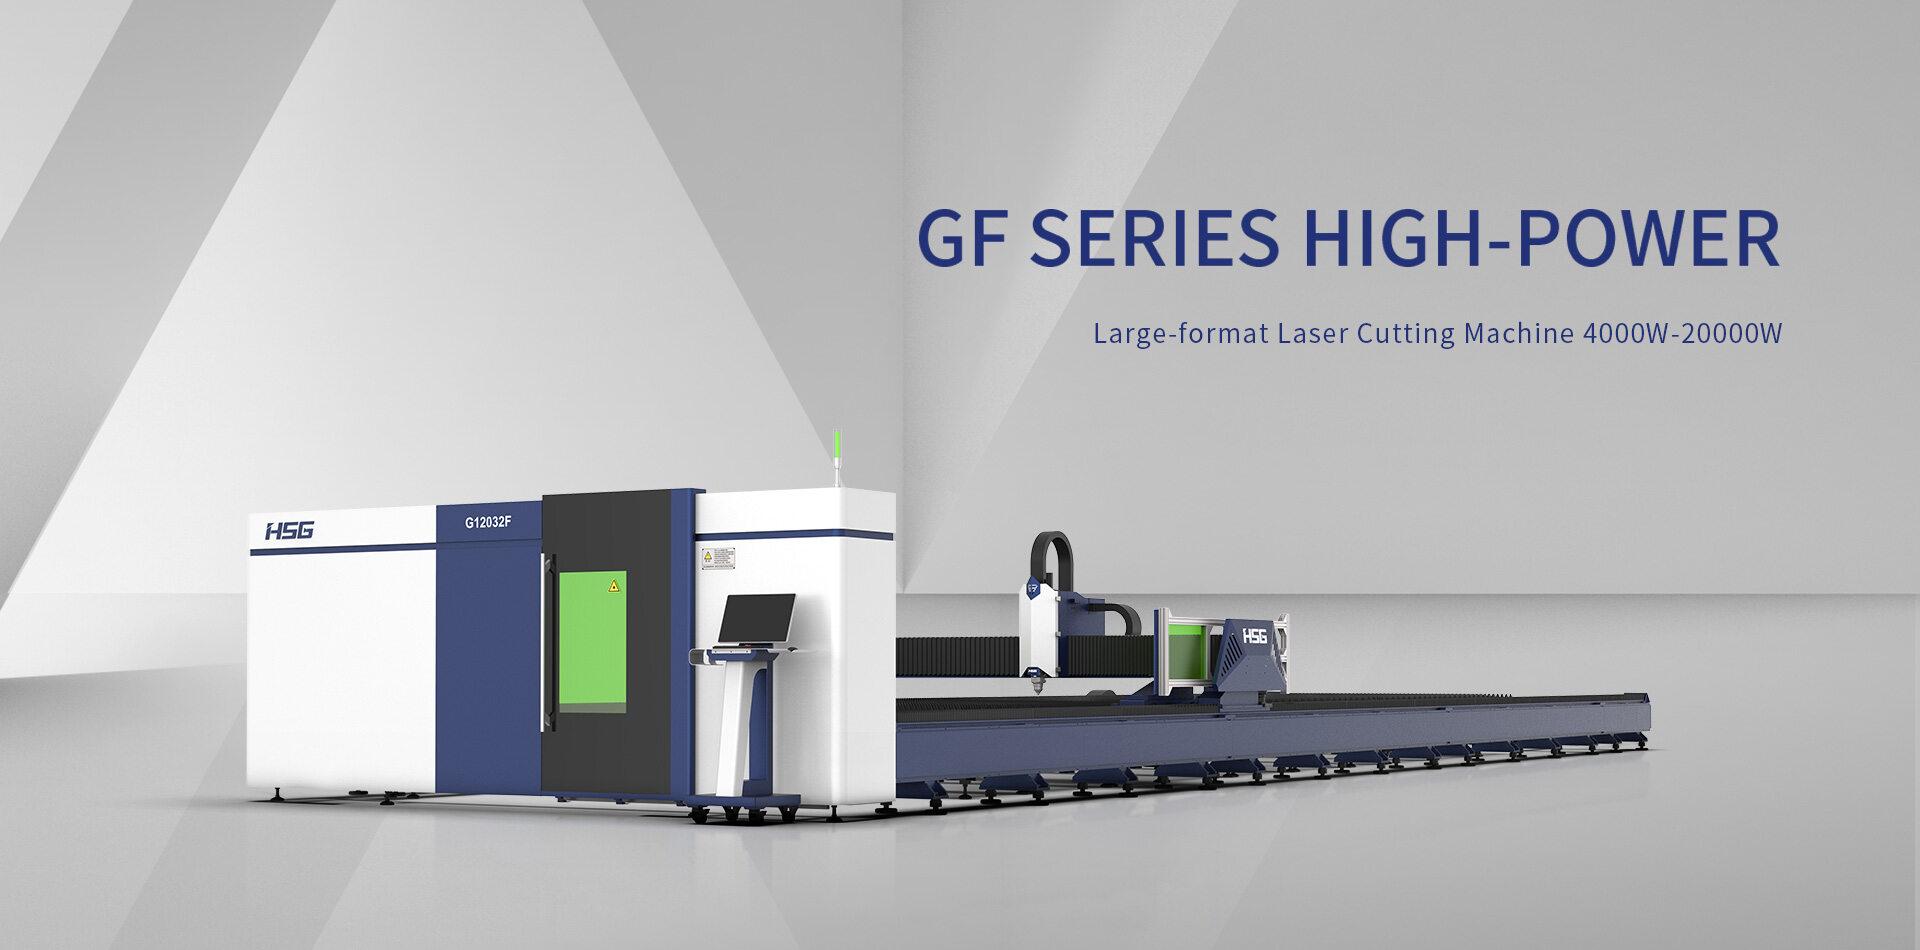 Máy cắt laser fiber HSG dòng GF